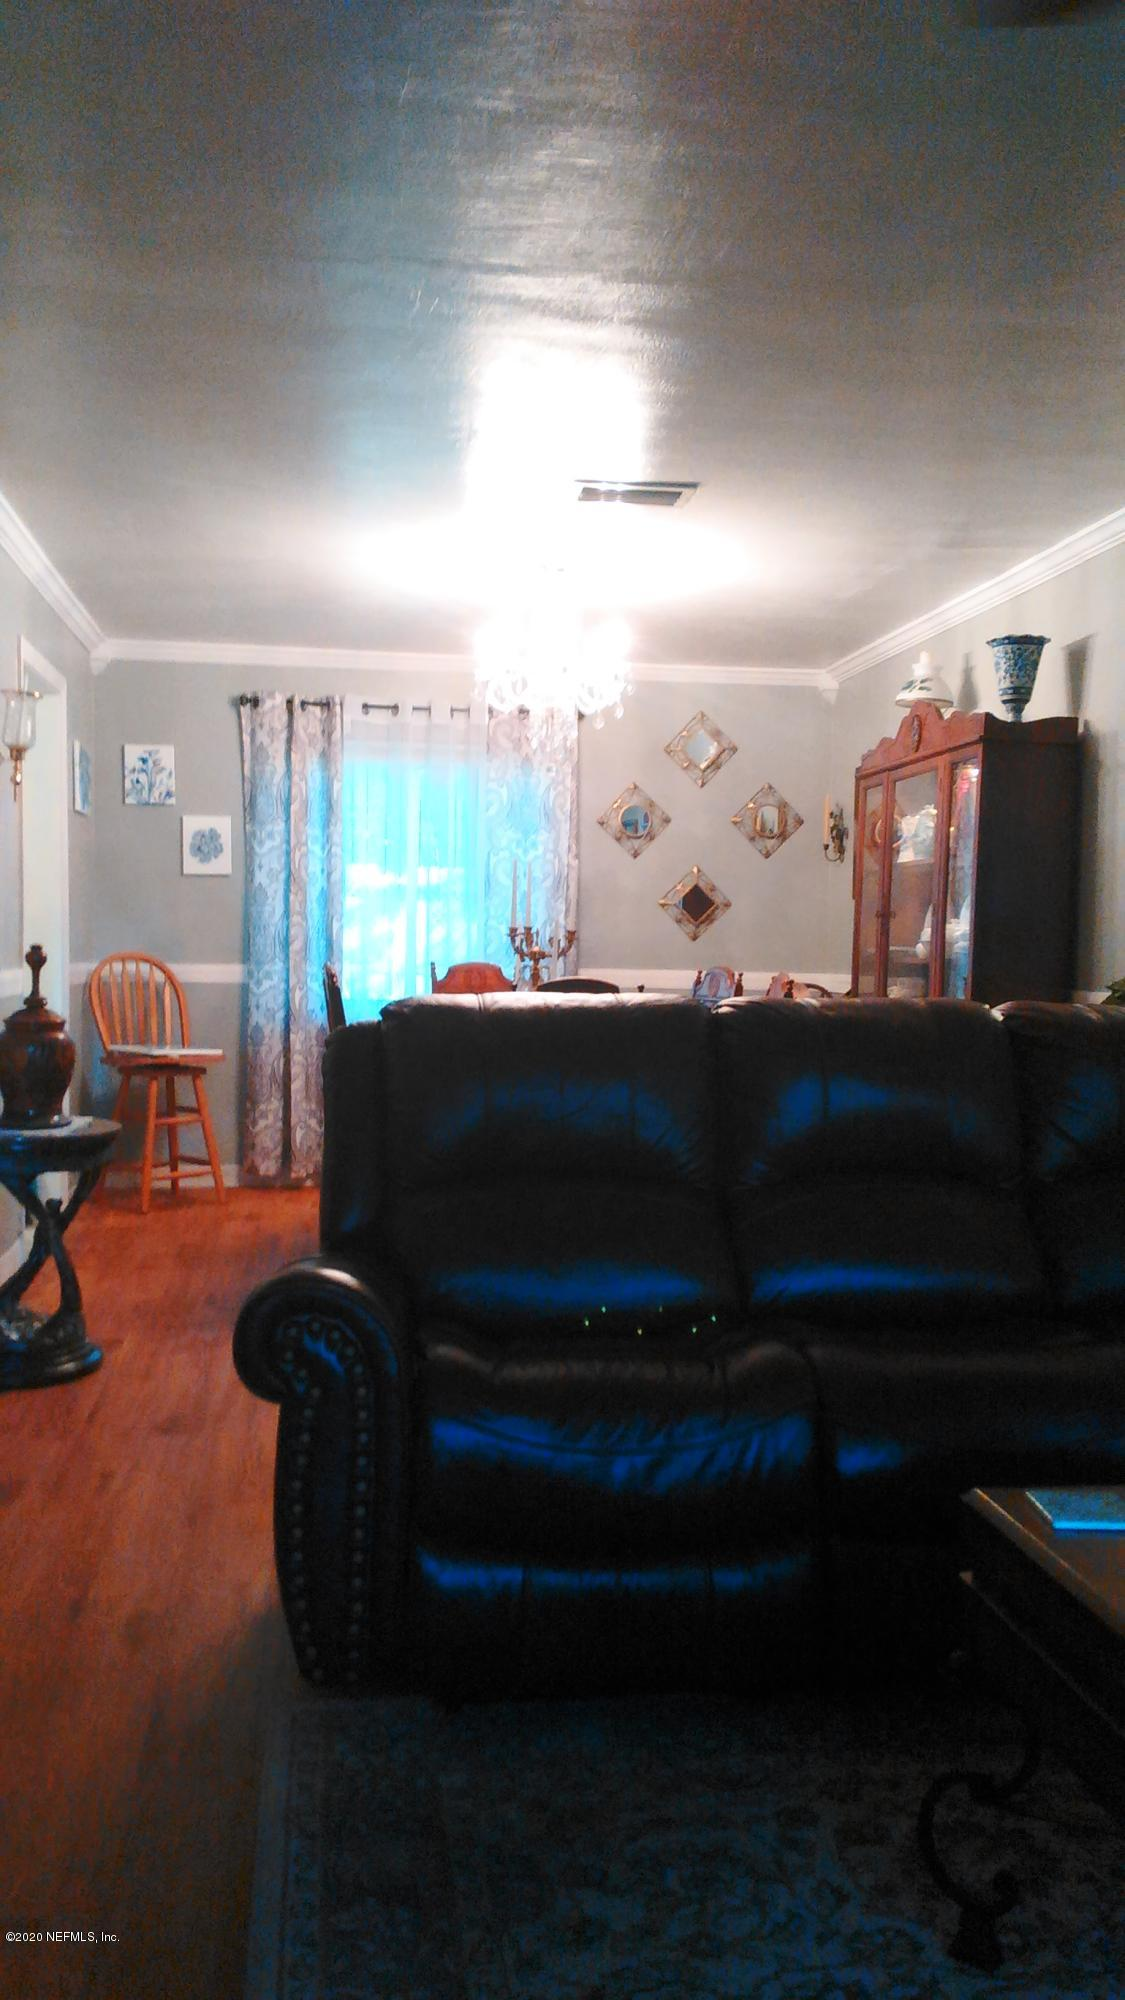 3523 CYPRESS, JACKSONVILLE, FLORIDA 32205, 3 Bedrooms Bedrooms, ,2 BathroomsBathrooms,Residential,For sale,CYPRESS,1081504